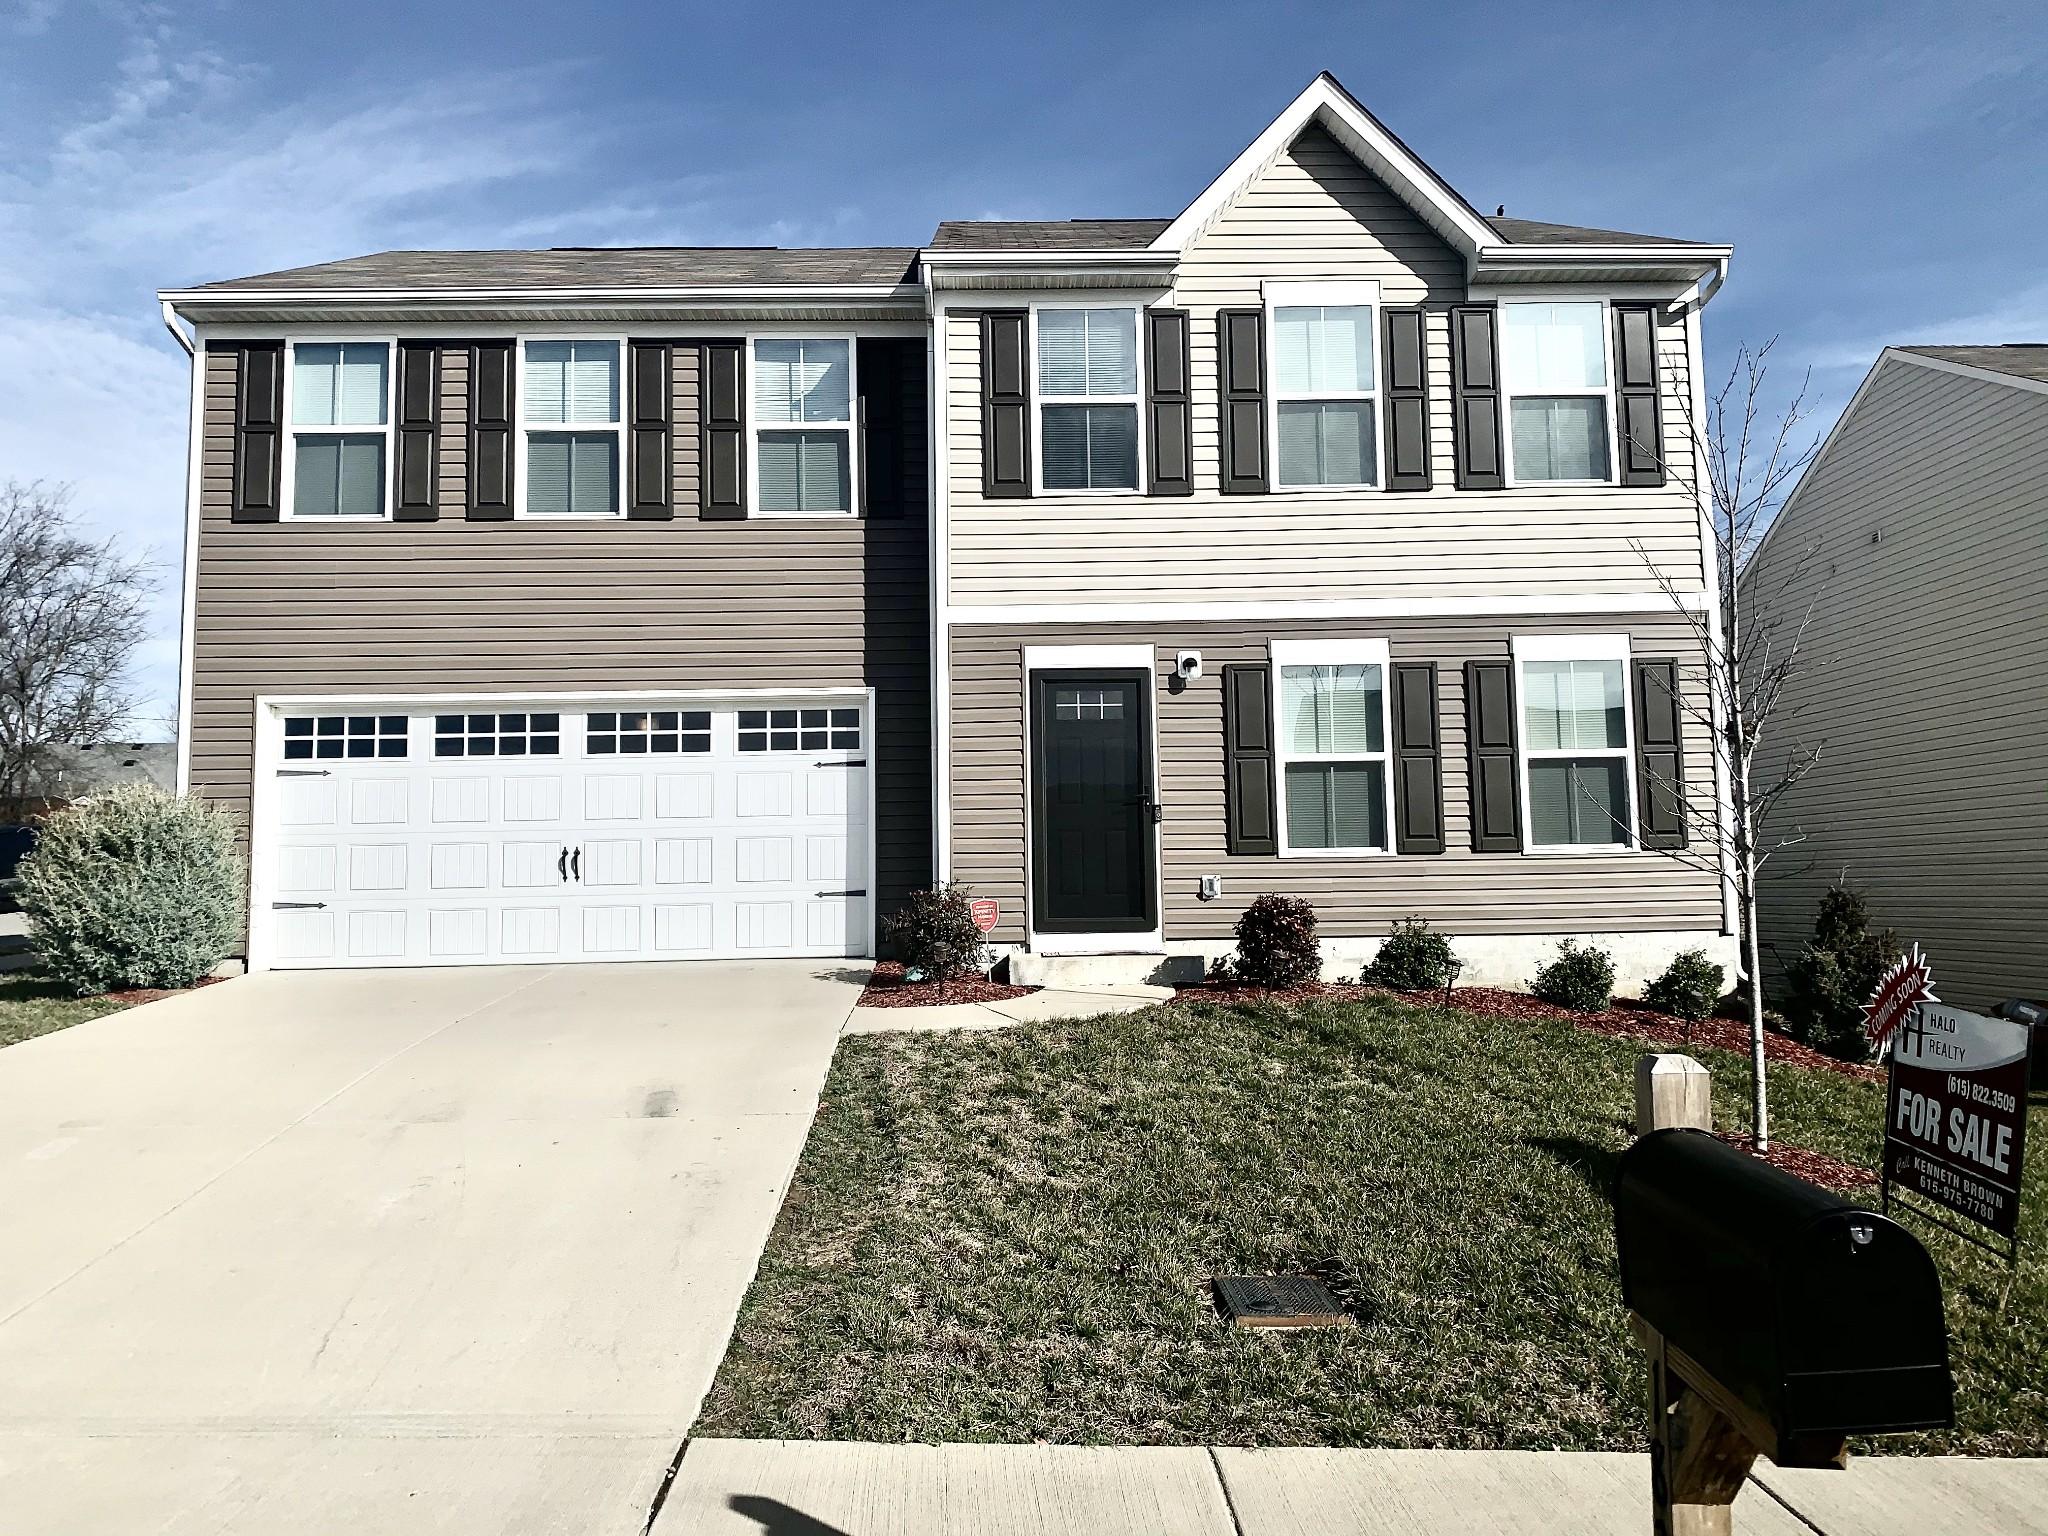 1837 Belle Arbor Dr, NE, Nashville, TN 37207 - Nashville, TN real estate listing